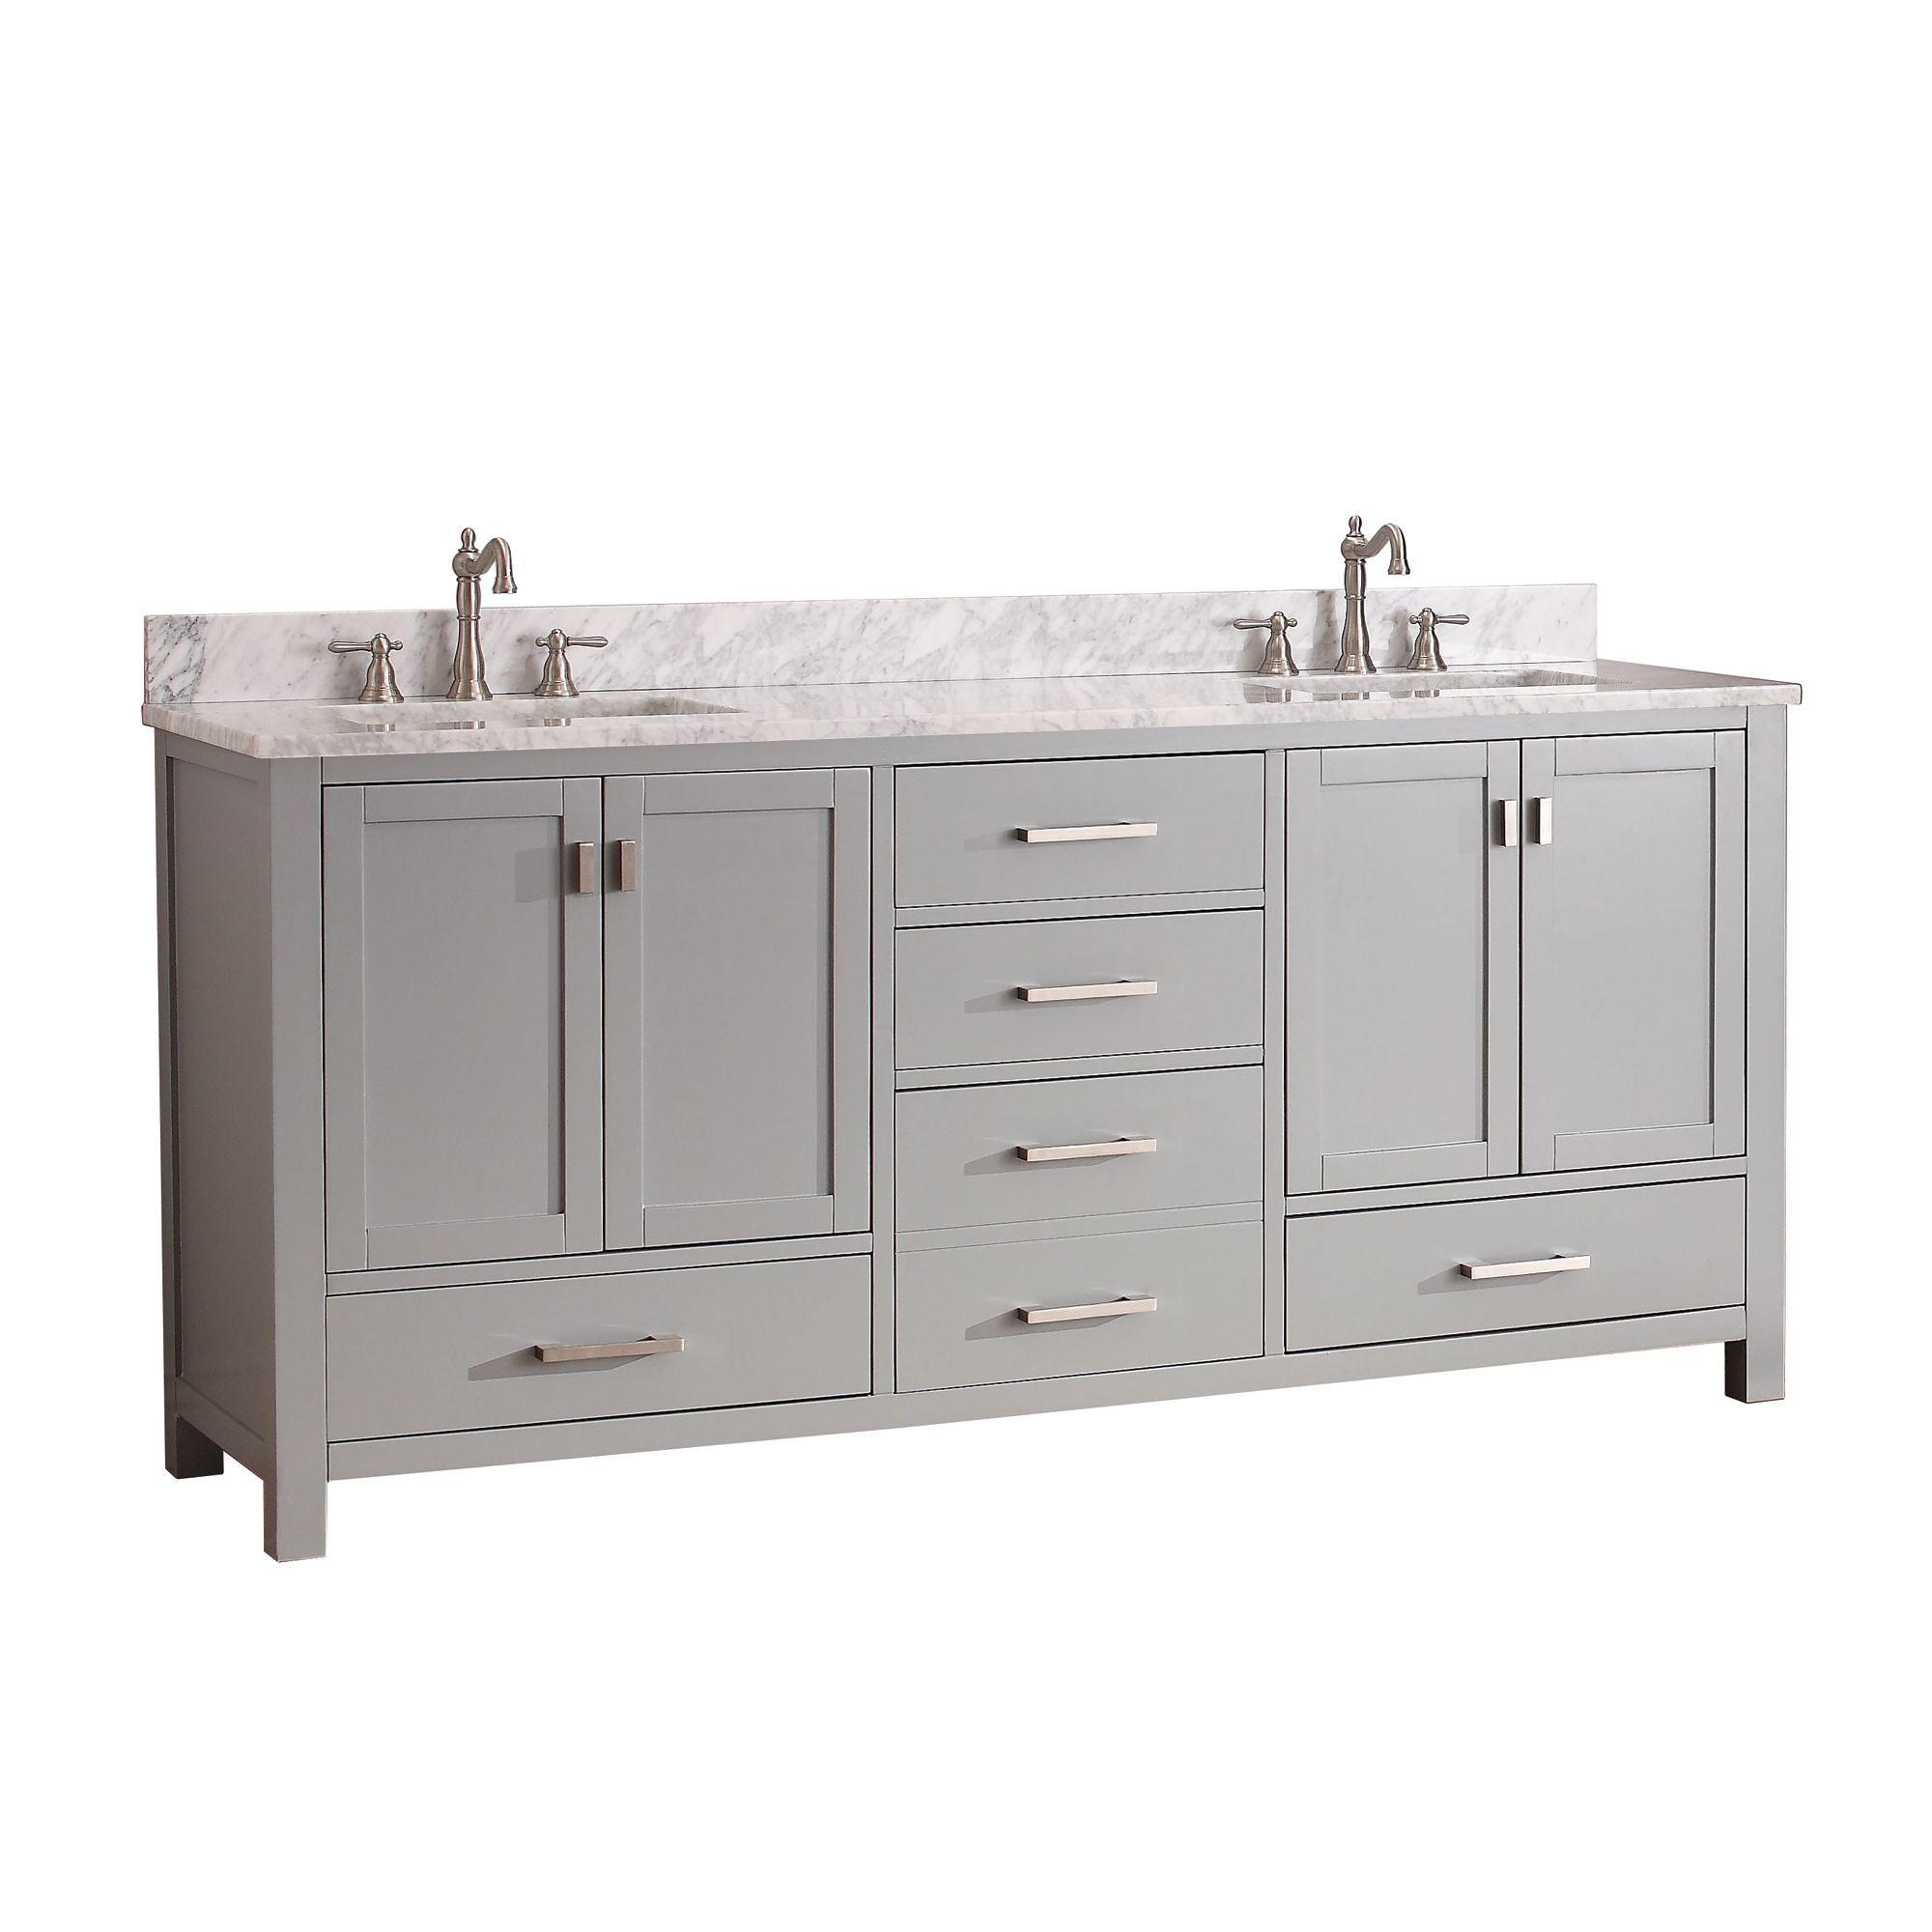 Avanity Modero Double Vanity Combo In Chilled Grey   Overstock Shopping    Great Deals On Bathroom